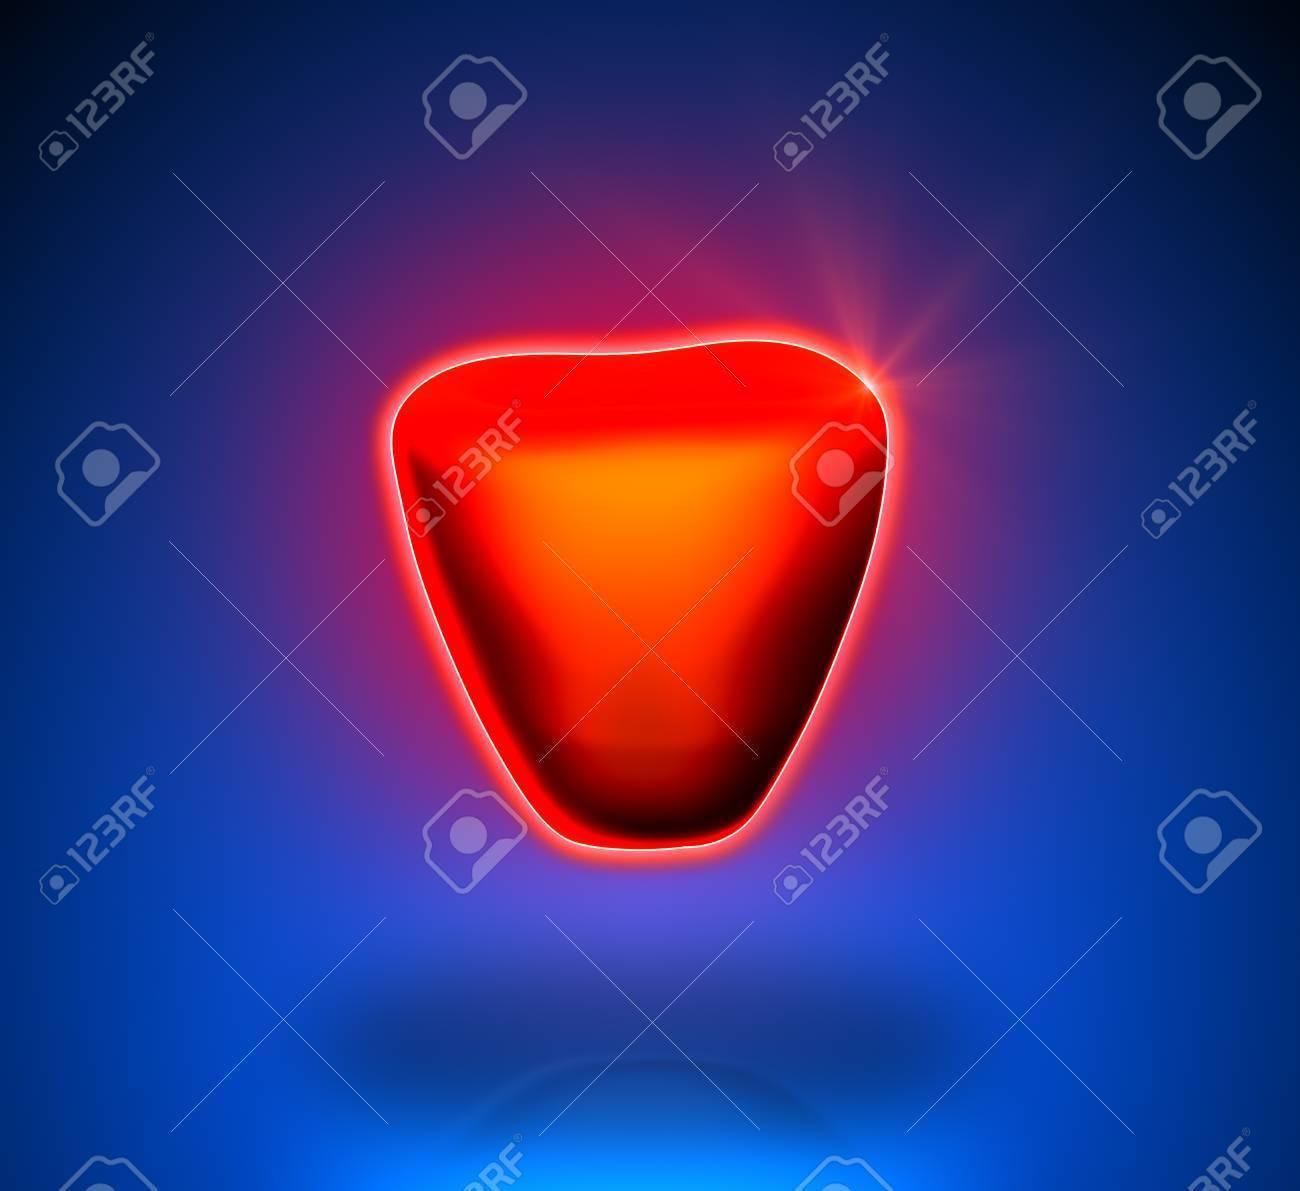 Prostate - Internal organs - blue background Stock Photo - 22971540